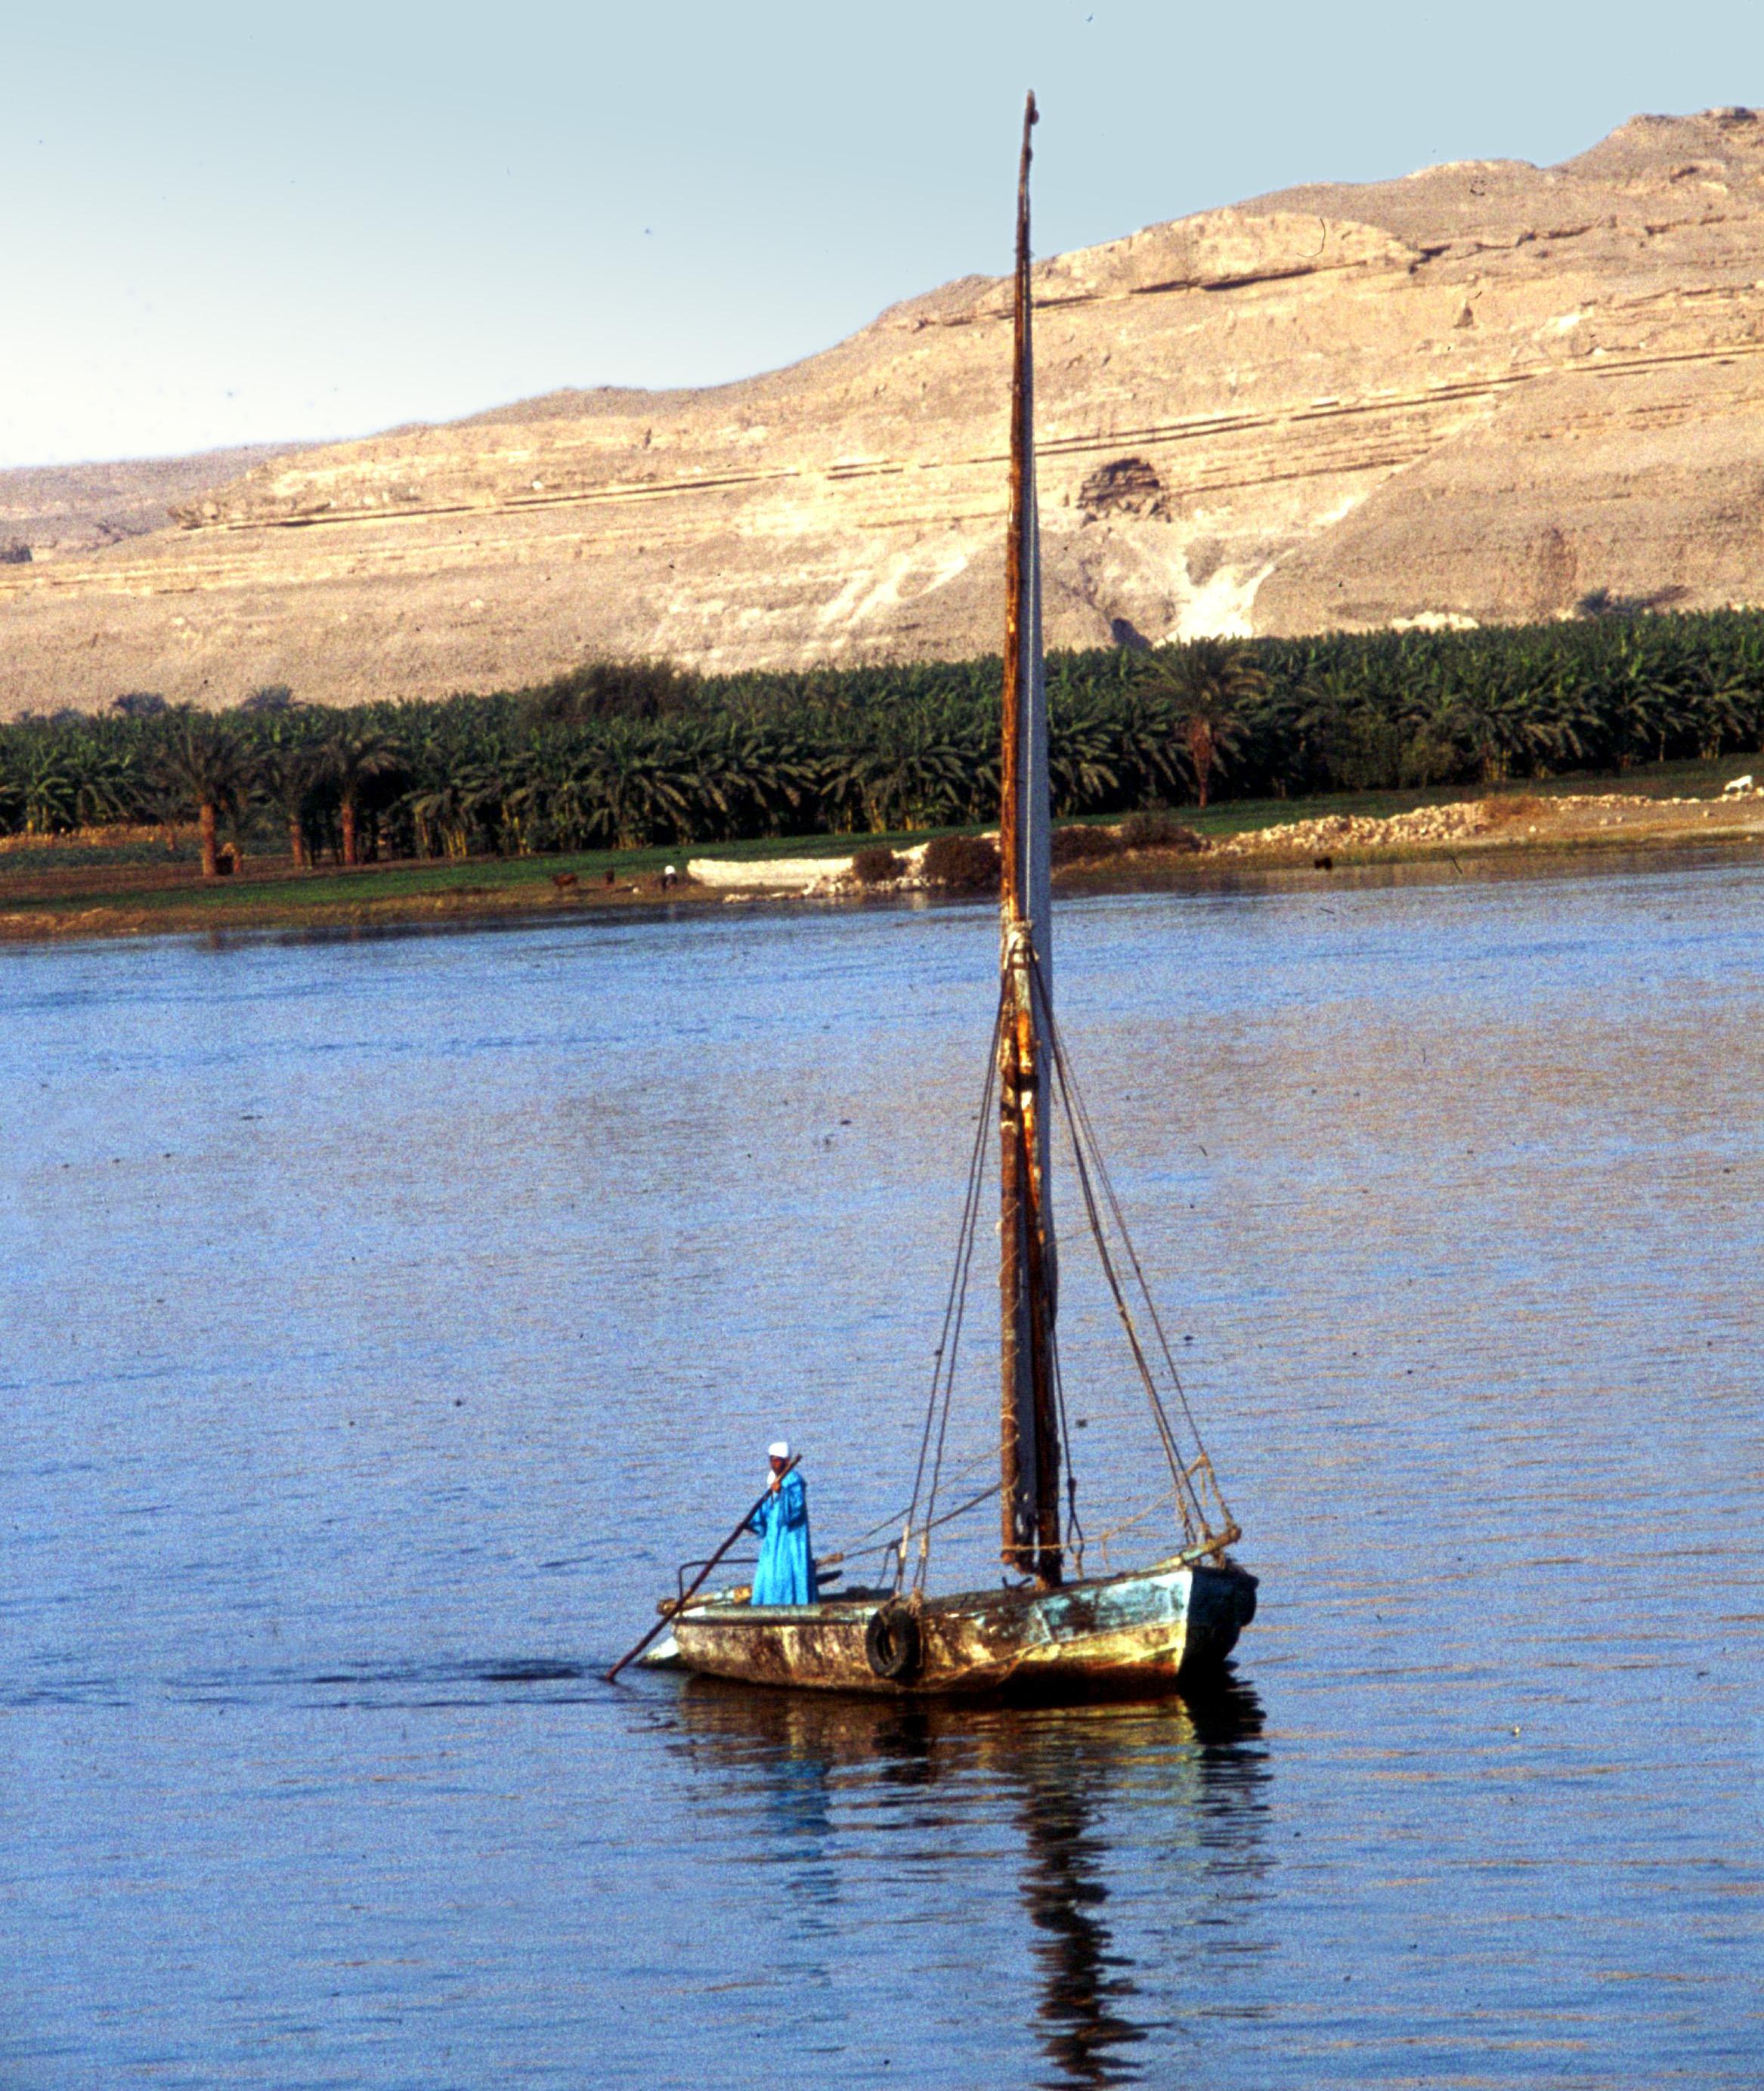 File:Al-Minya-12-Boot auf Nil-1982-gje.jpg - Wikimedia Commons